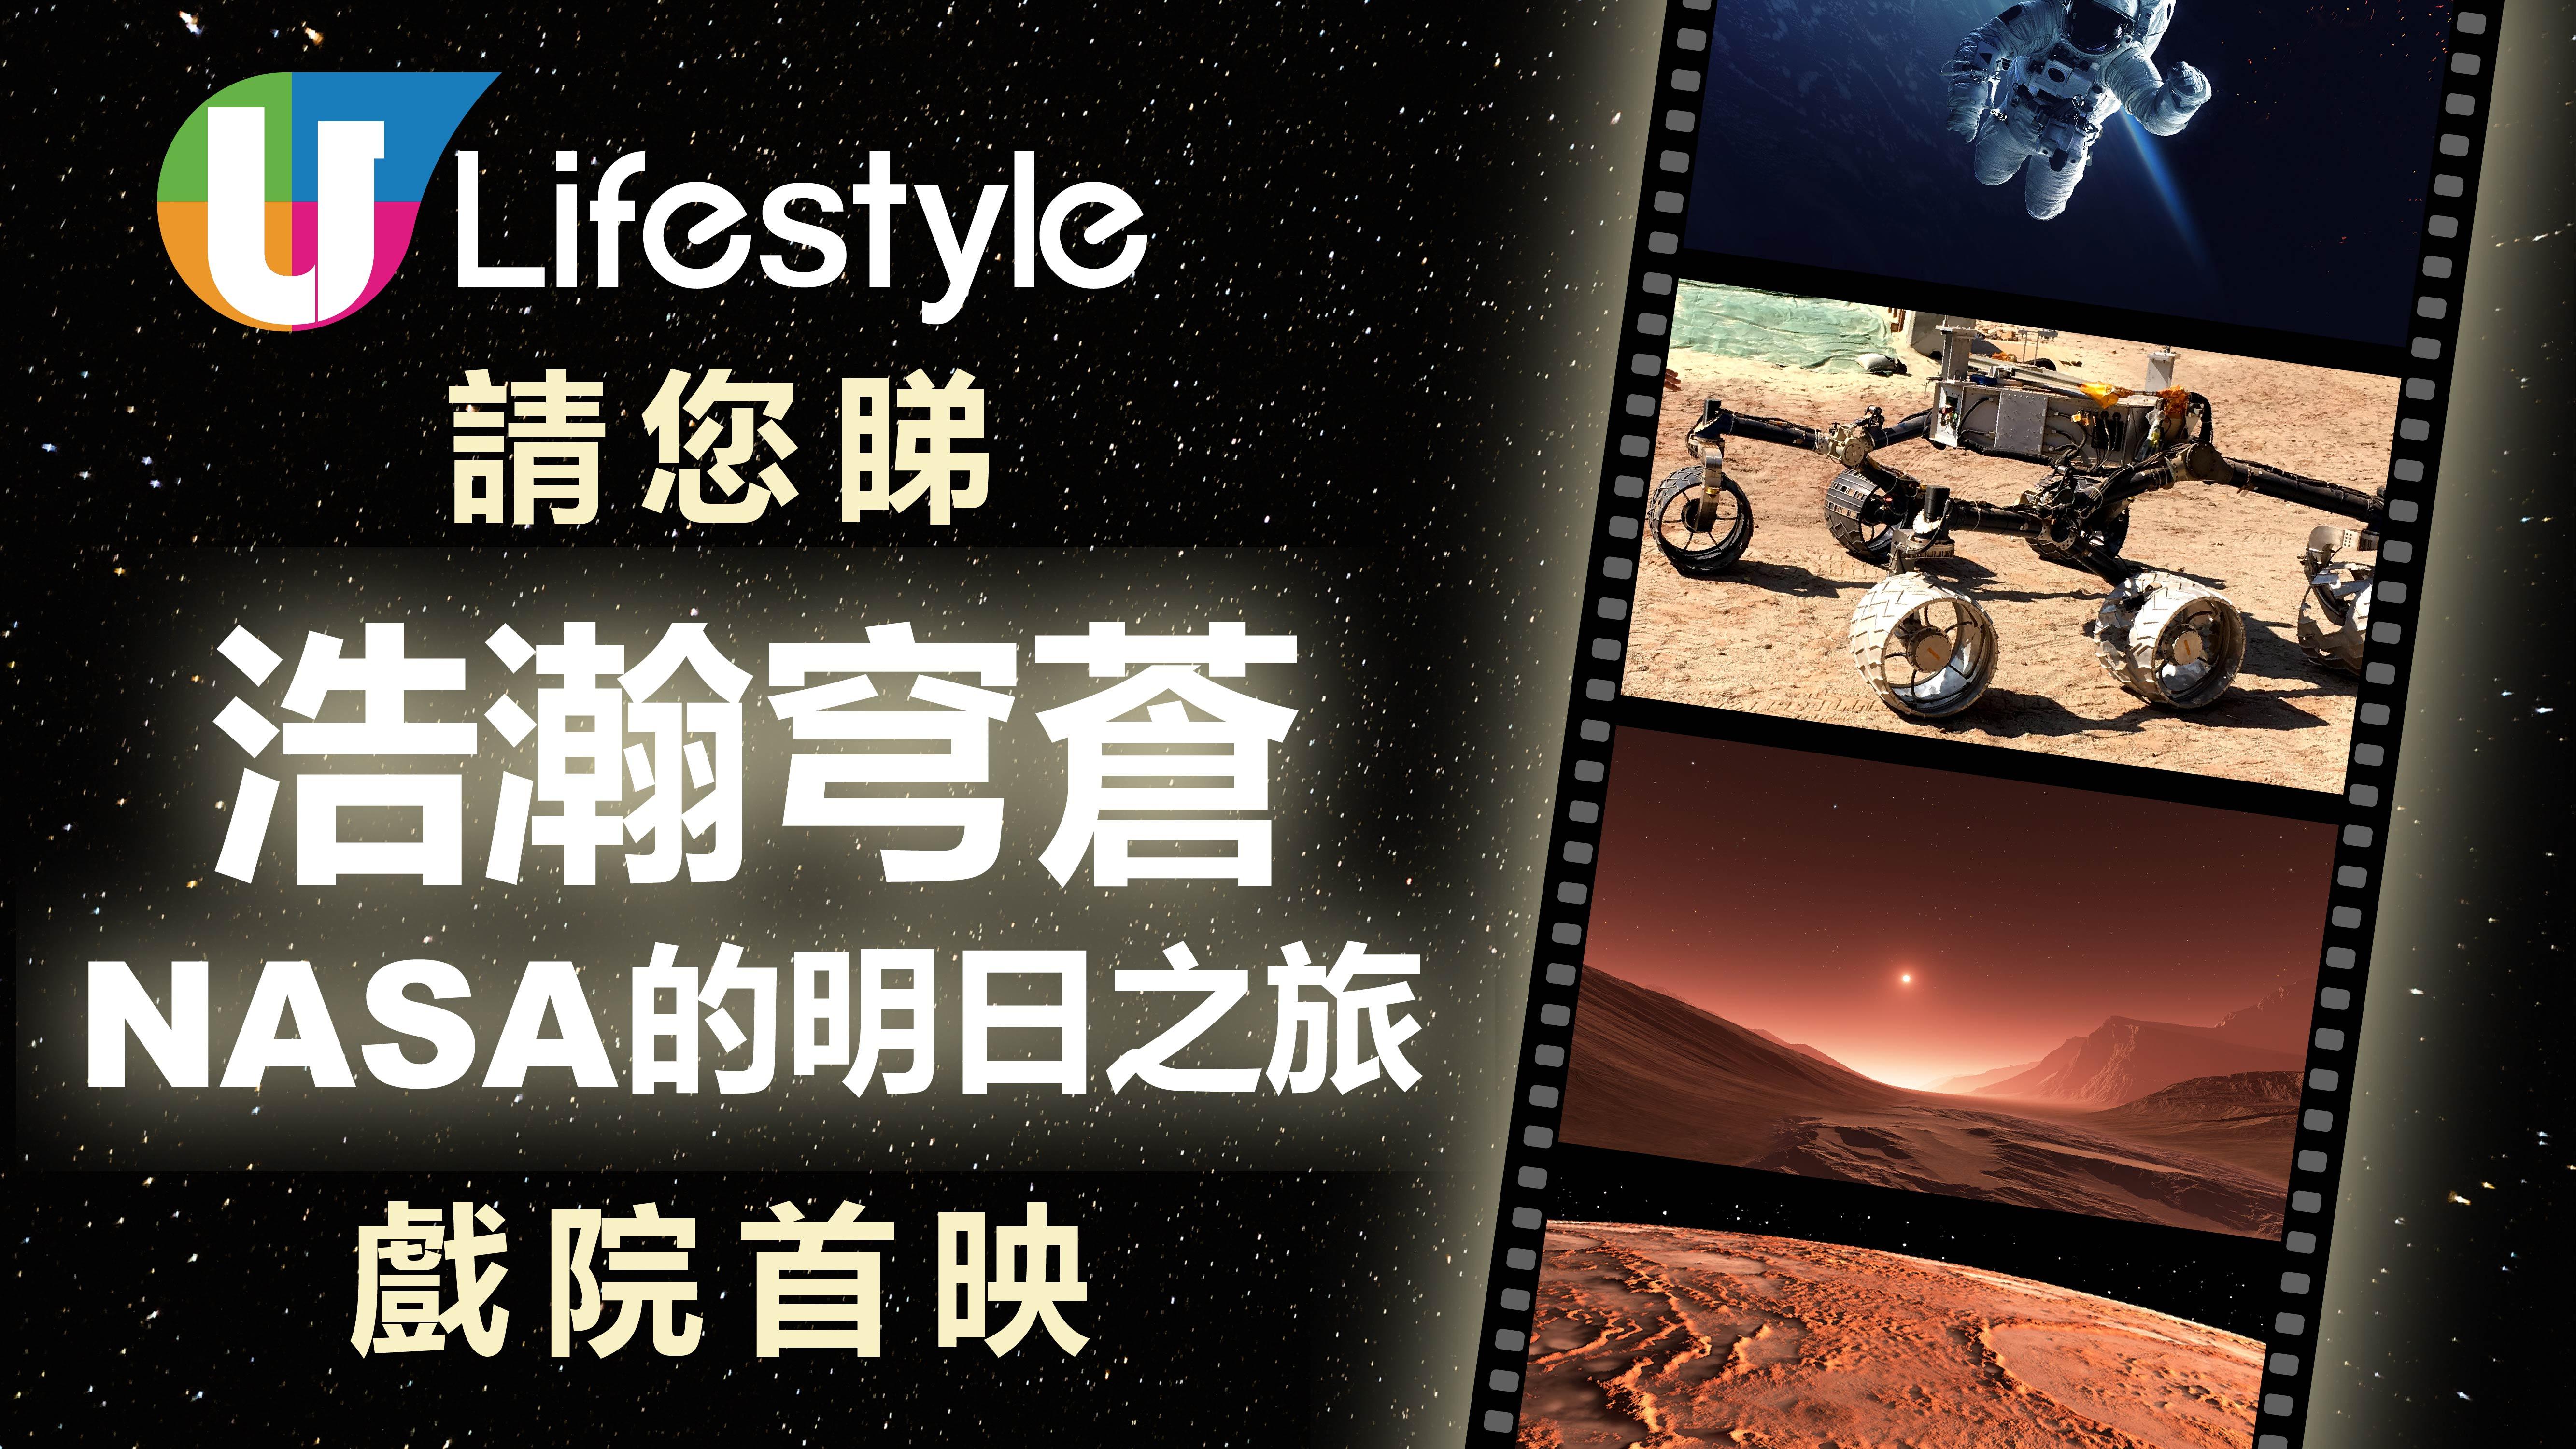 U Lifestyle請您睇《浩瀚穹蒼:NASA 的明日之旅》戲院首映!